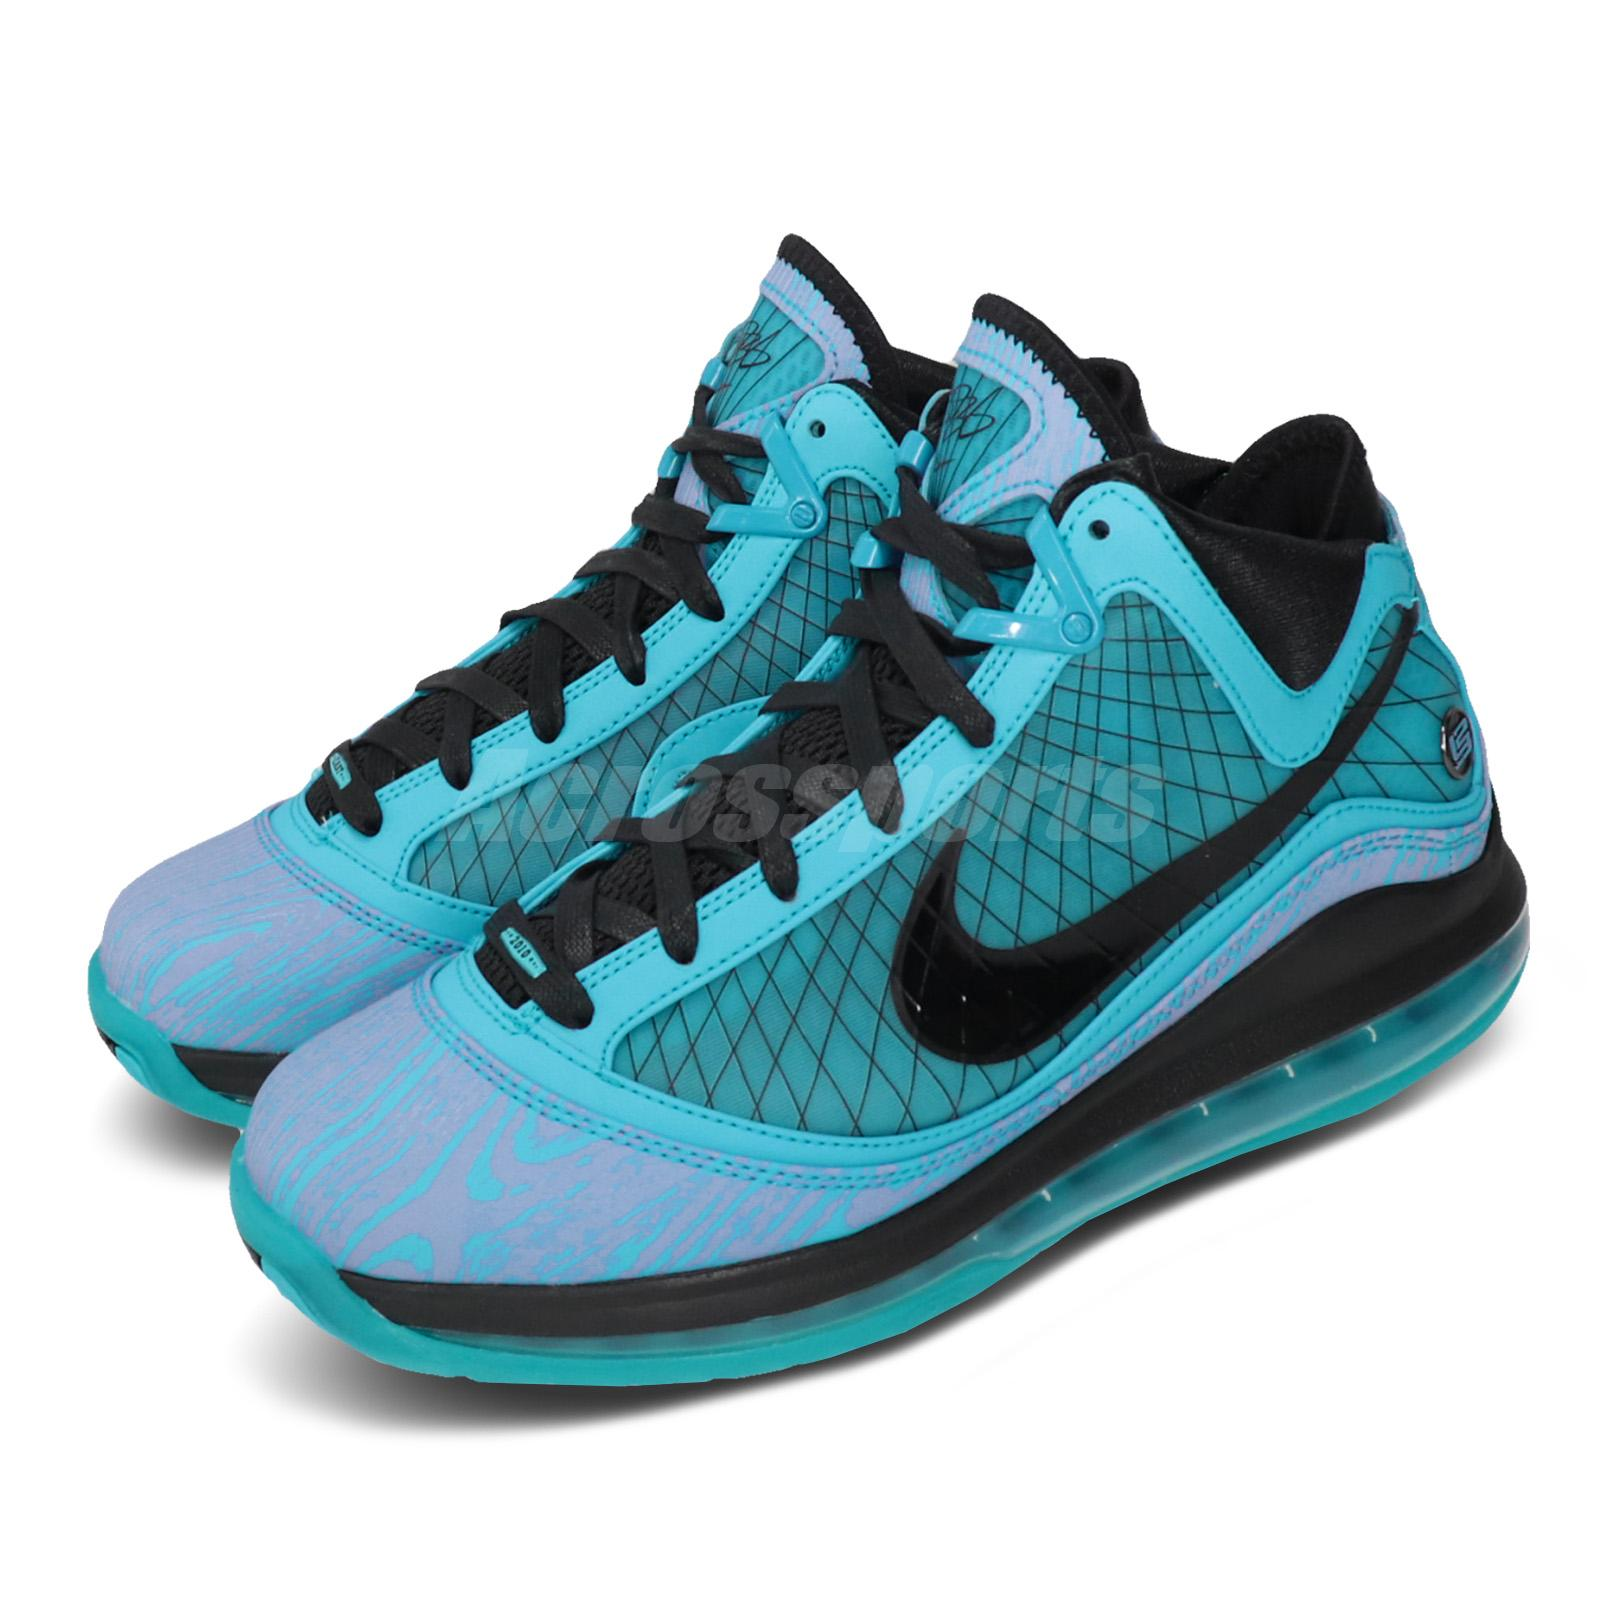 Details about Nike LeBron 7 VII All Star Chlorine Blue James Men Basketball  Shoes CU5646-400